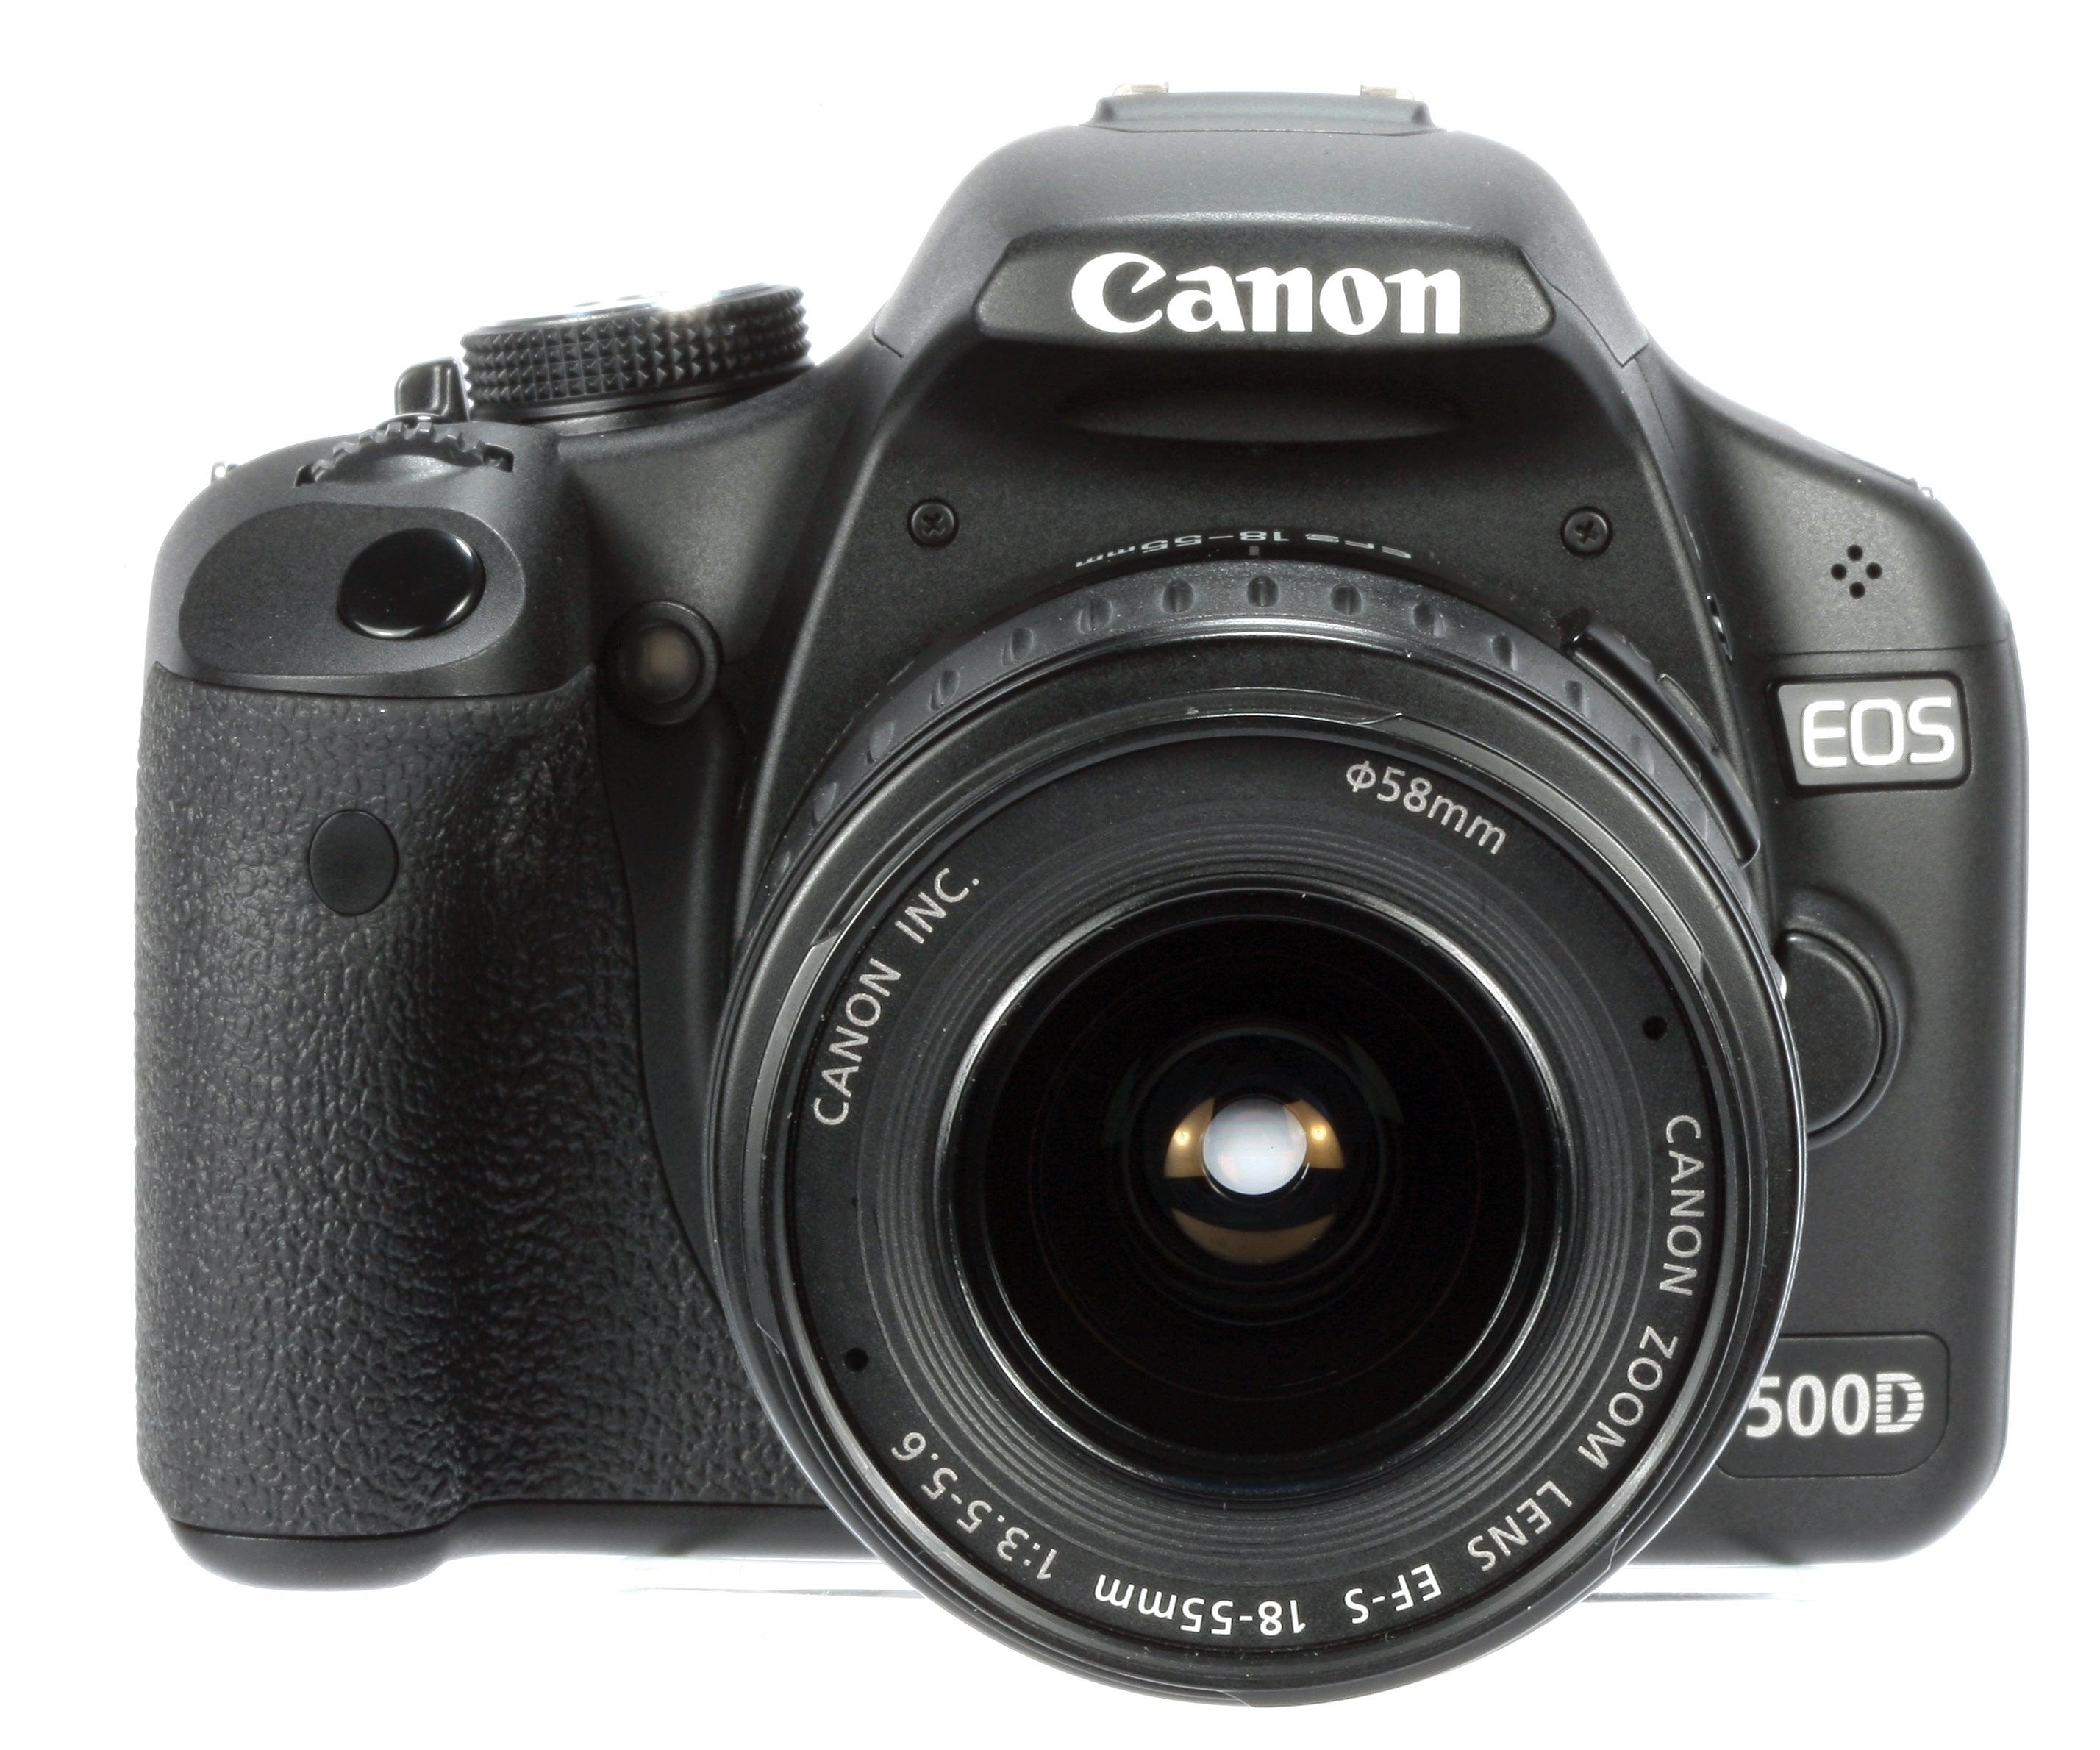 Canon 500D product shot